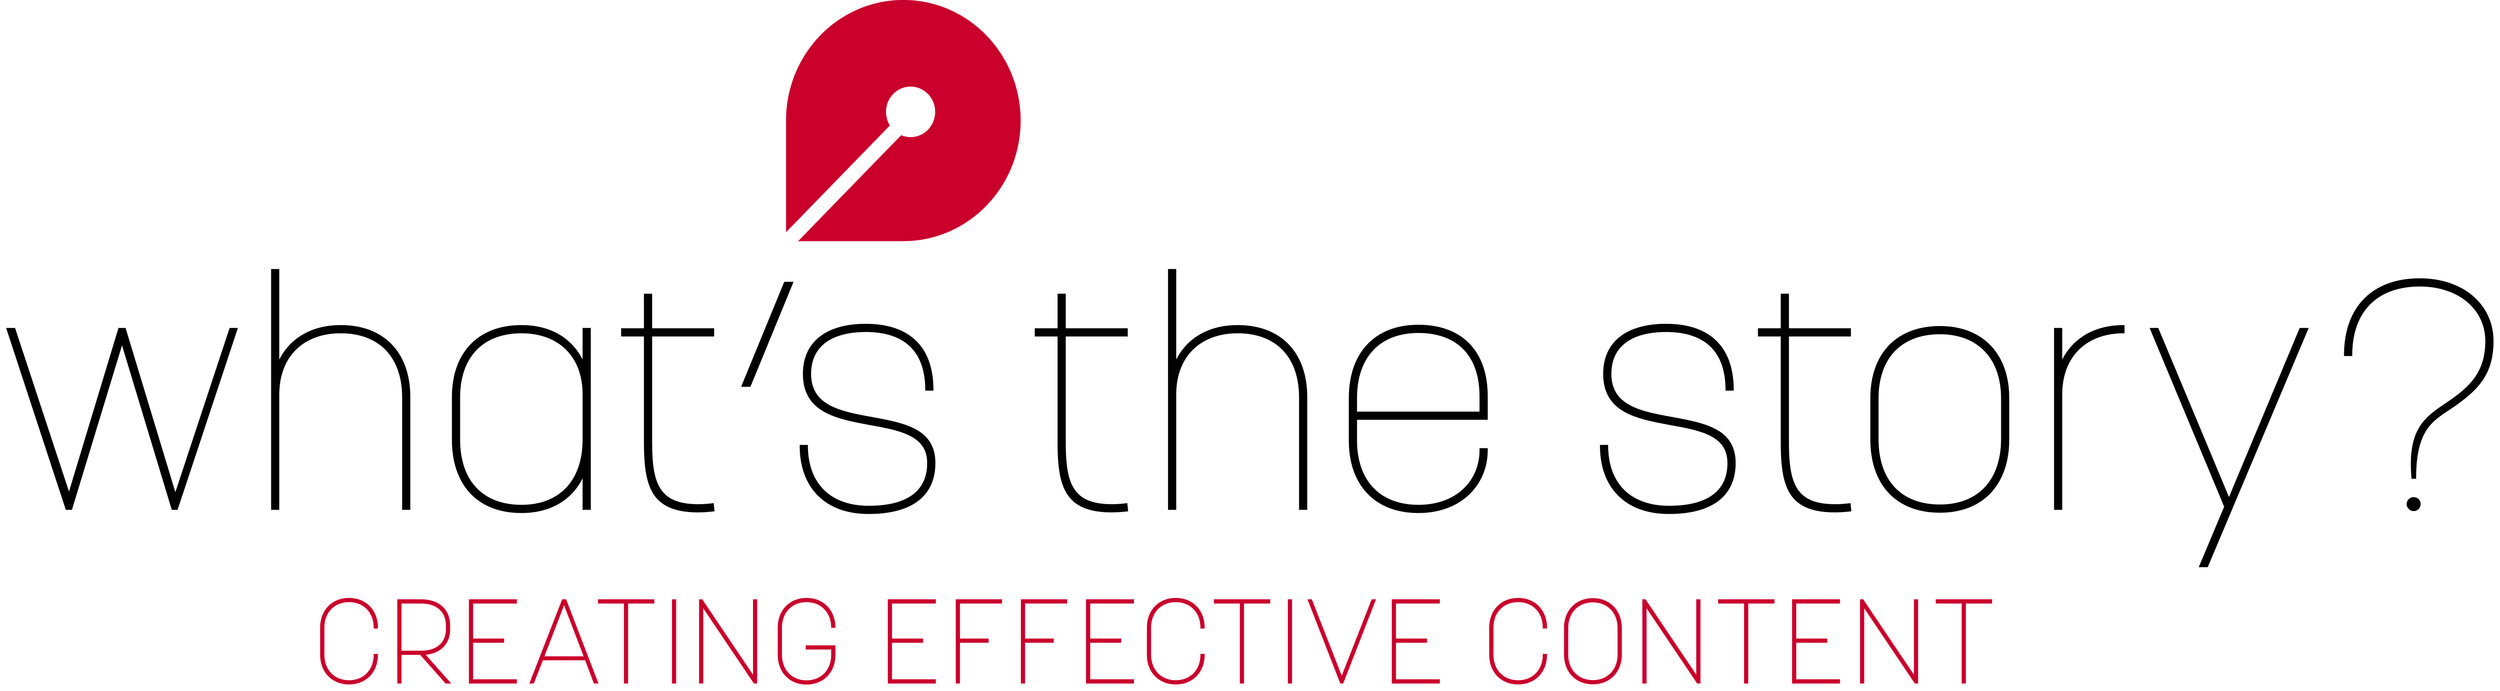 WTS_Logo.jpg